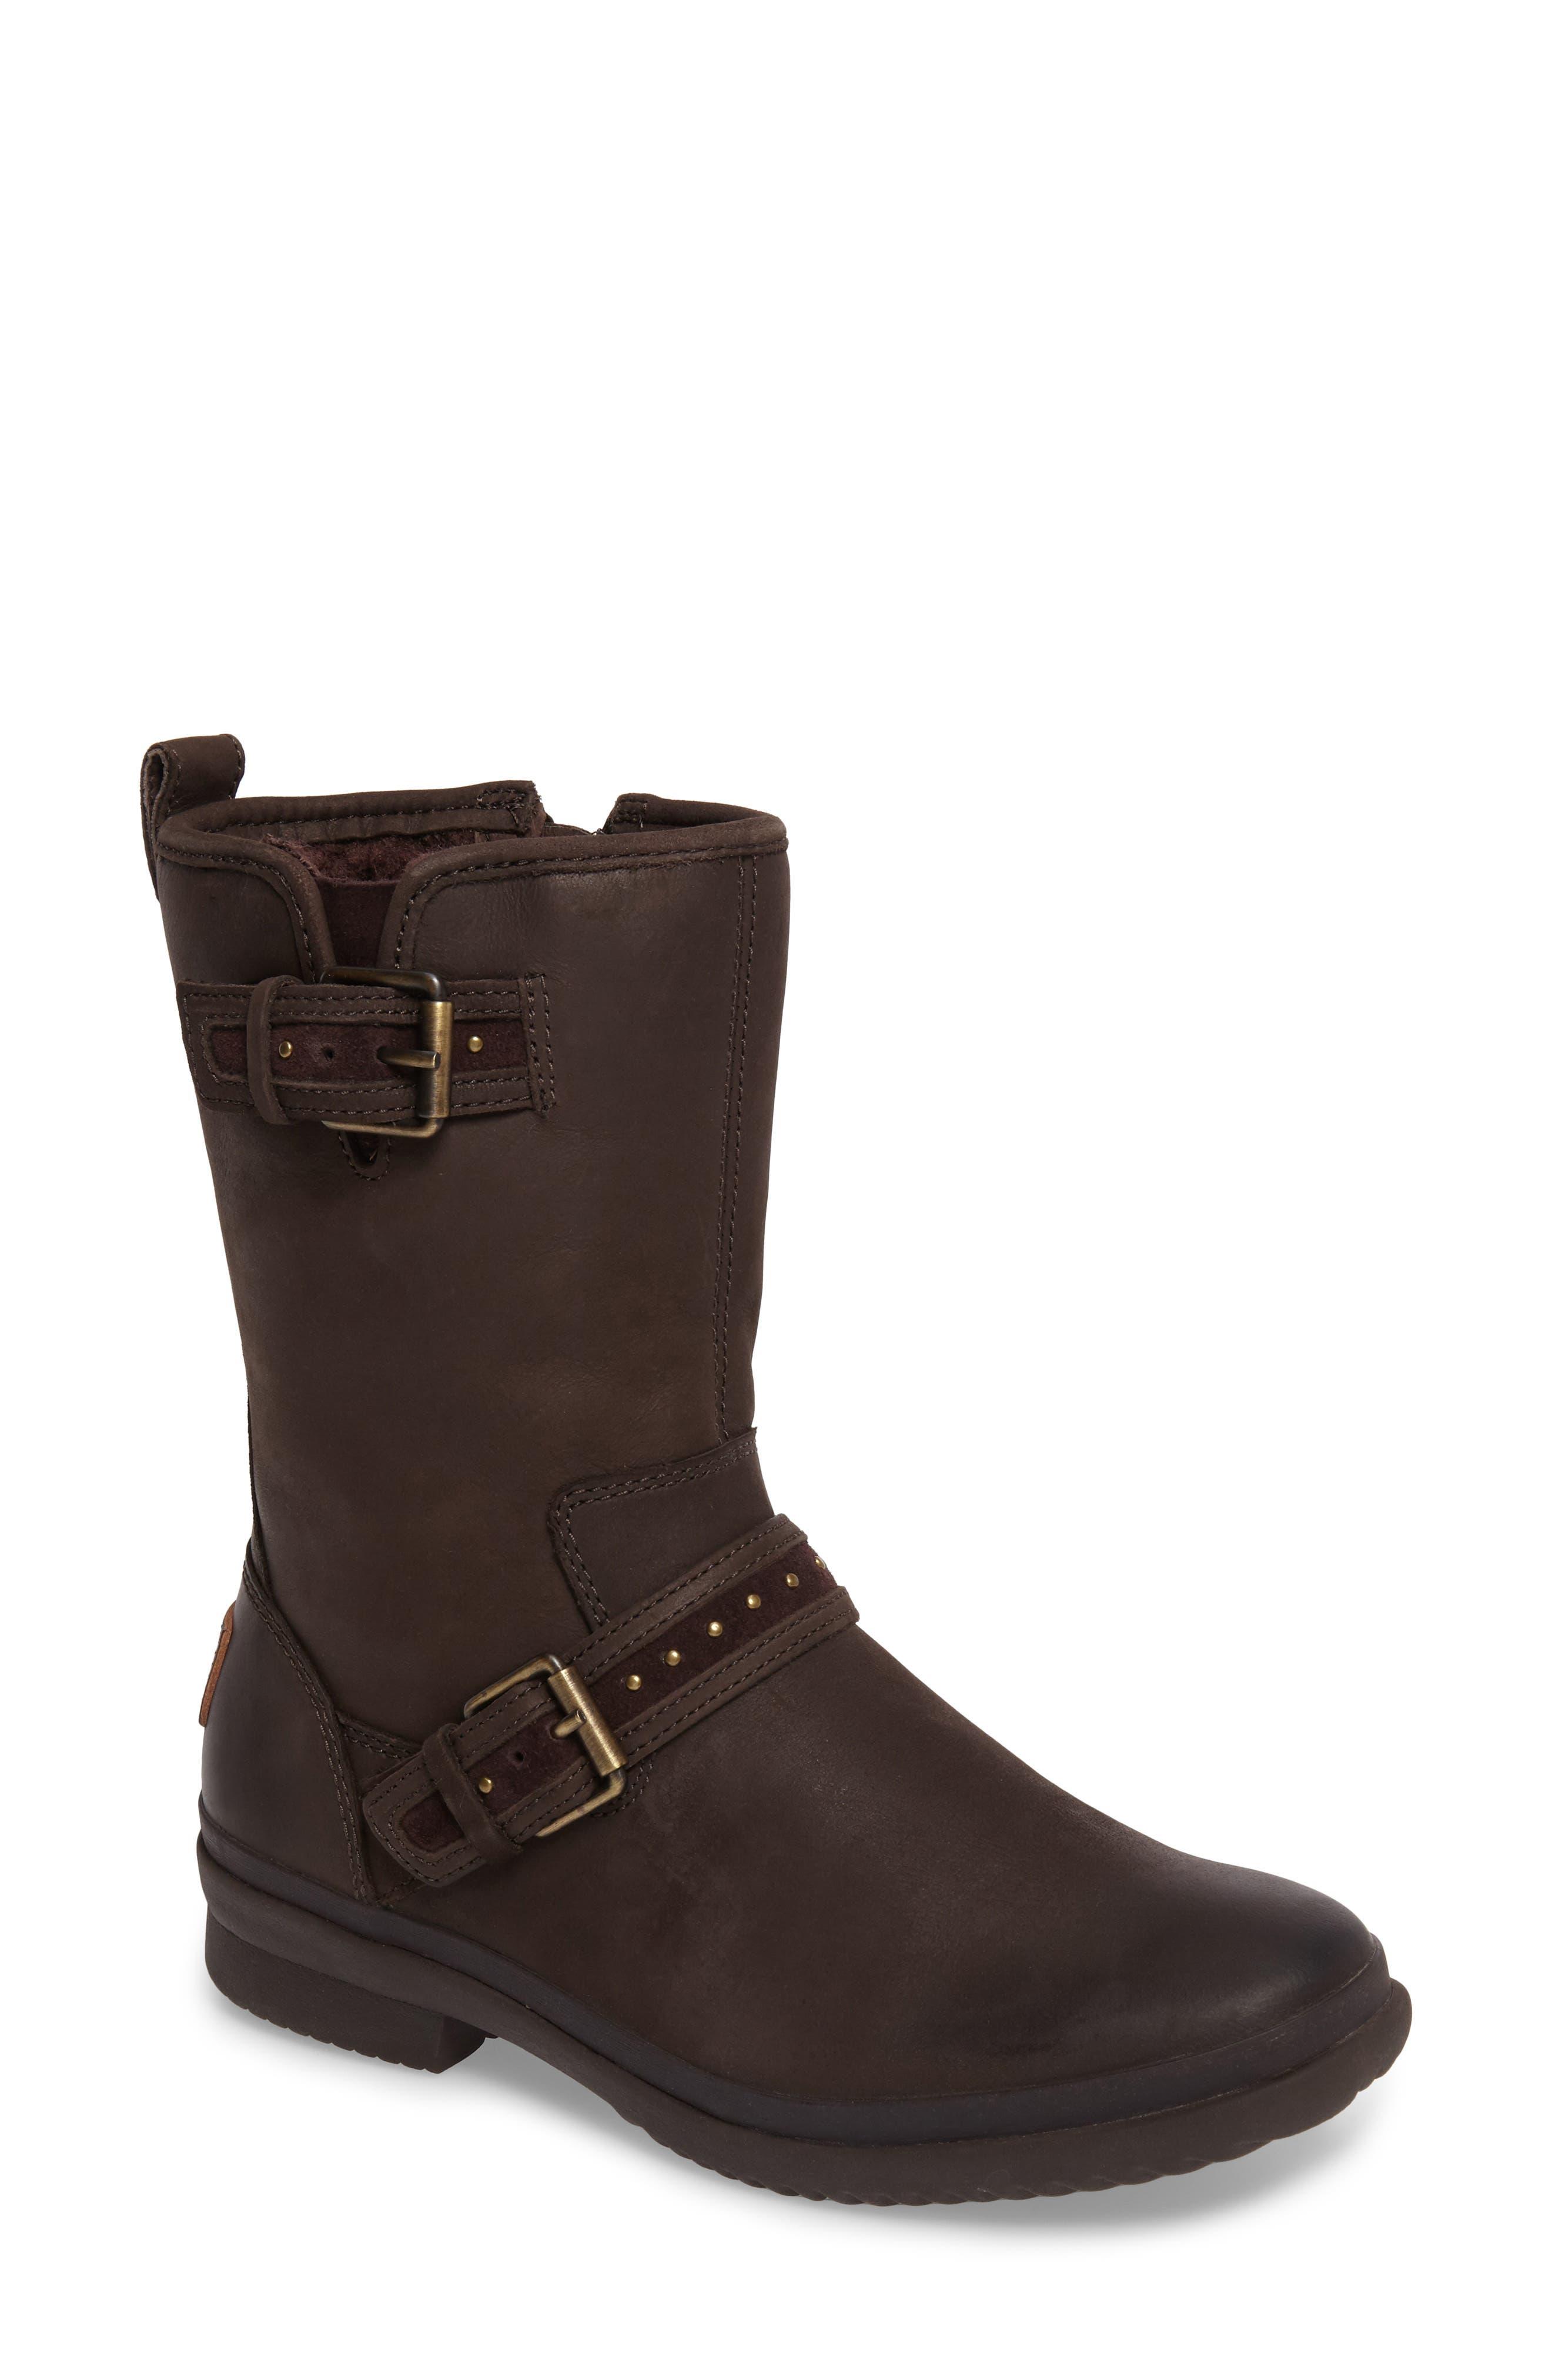 Main Image - UGG® Jenise Waterproof Boot (Women)